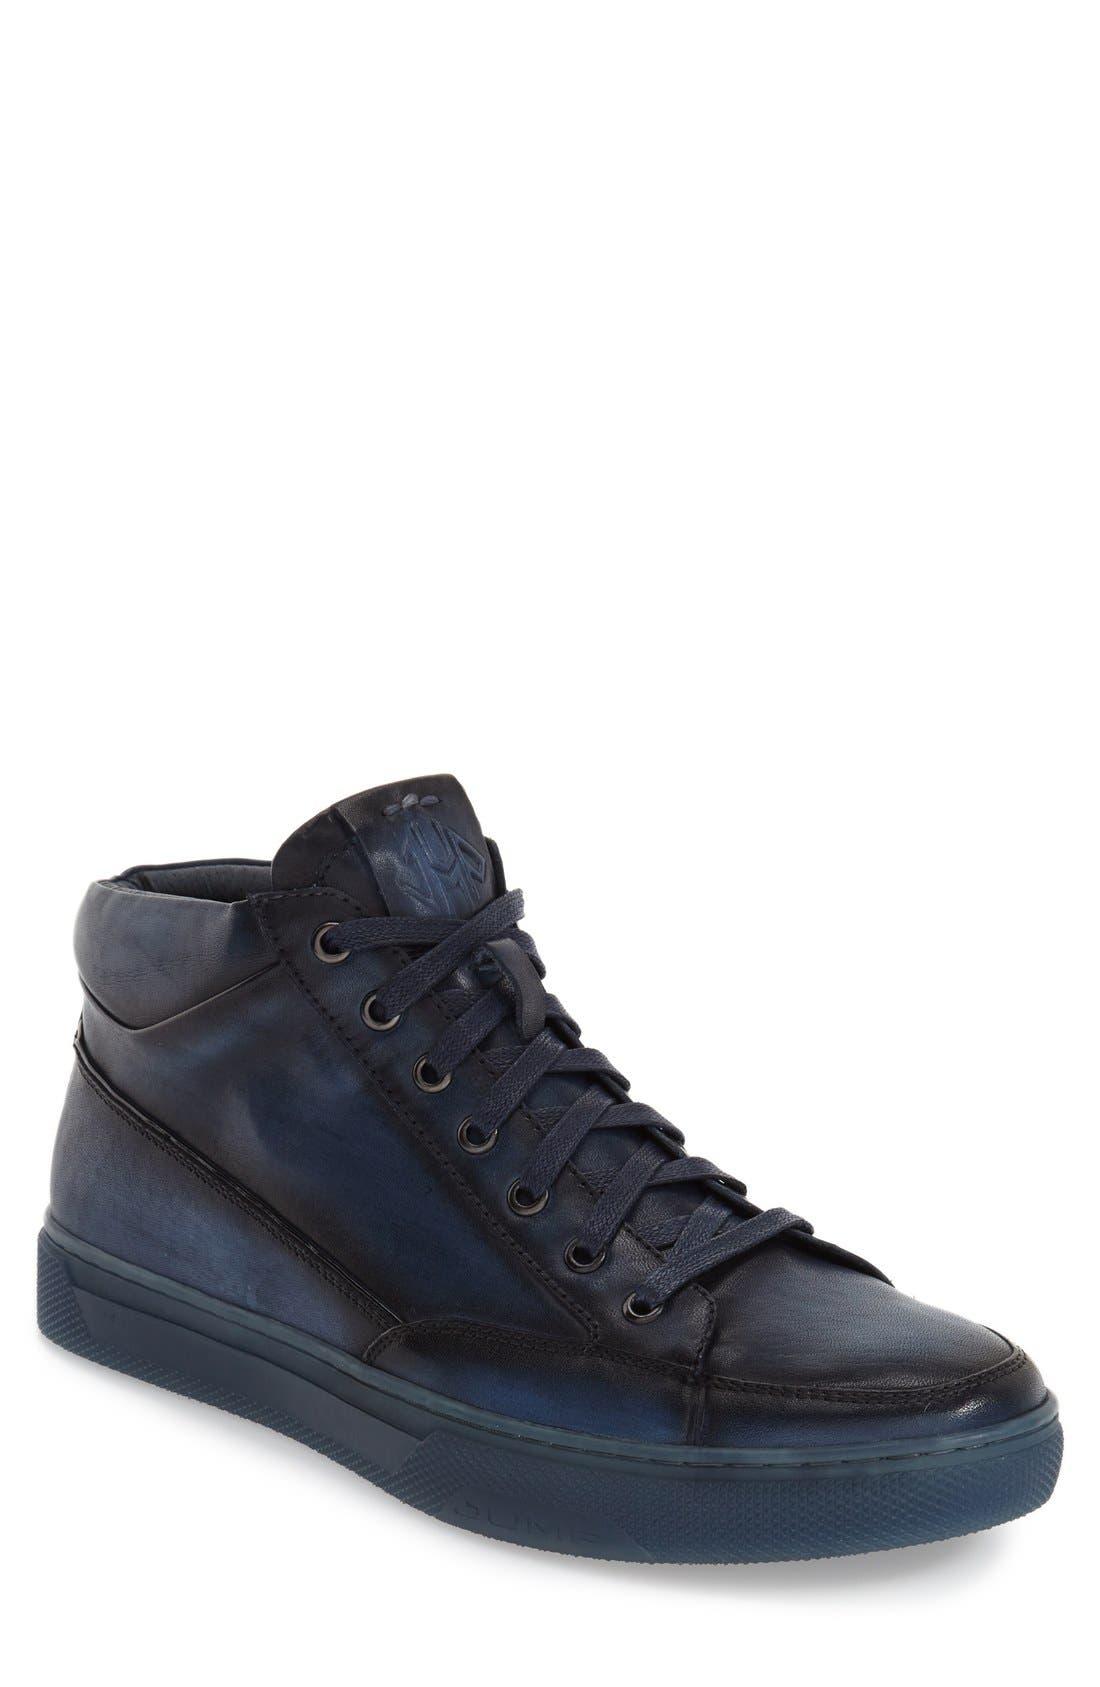 JUMP 'Strickland' Sneaker